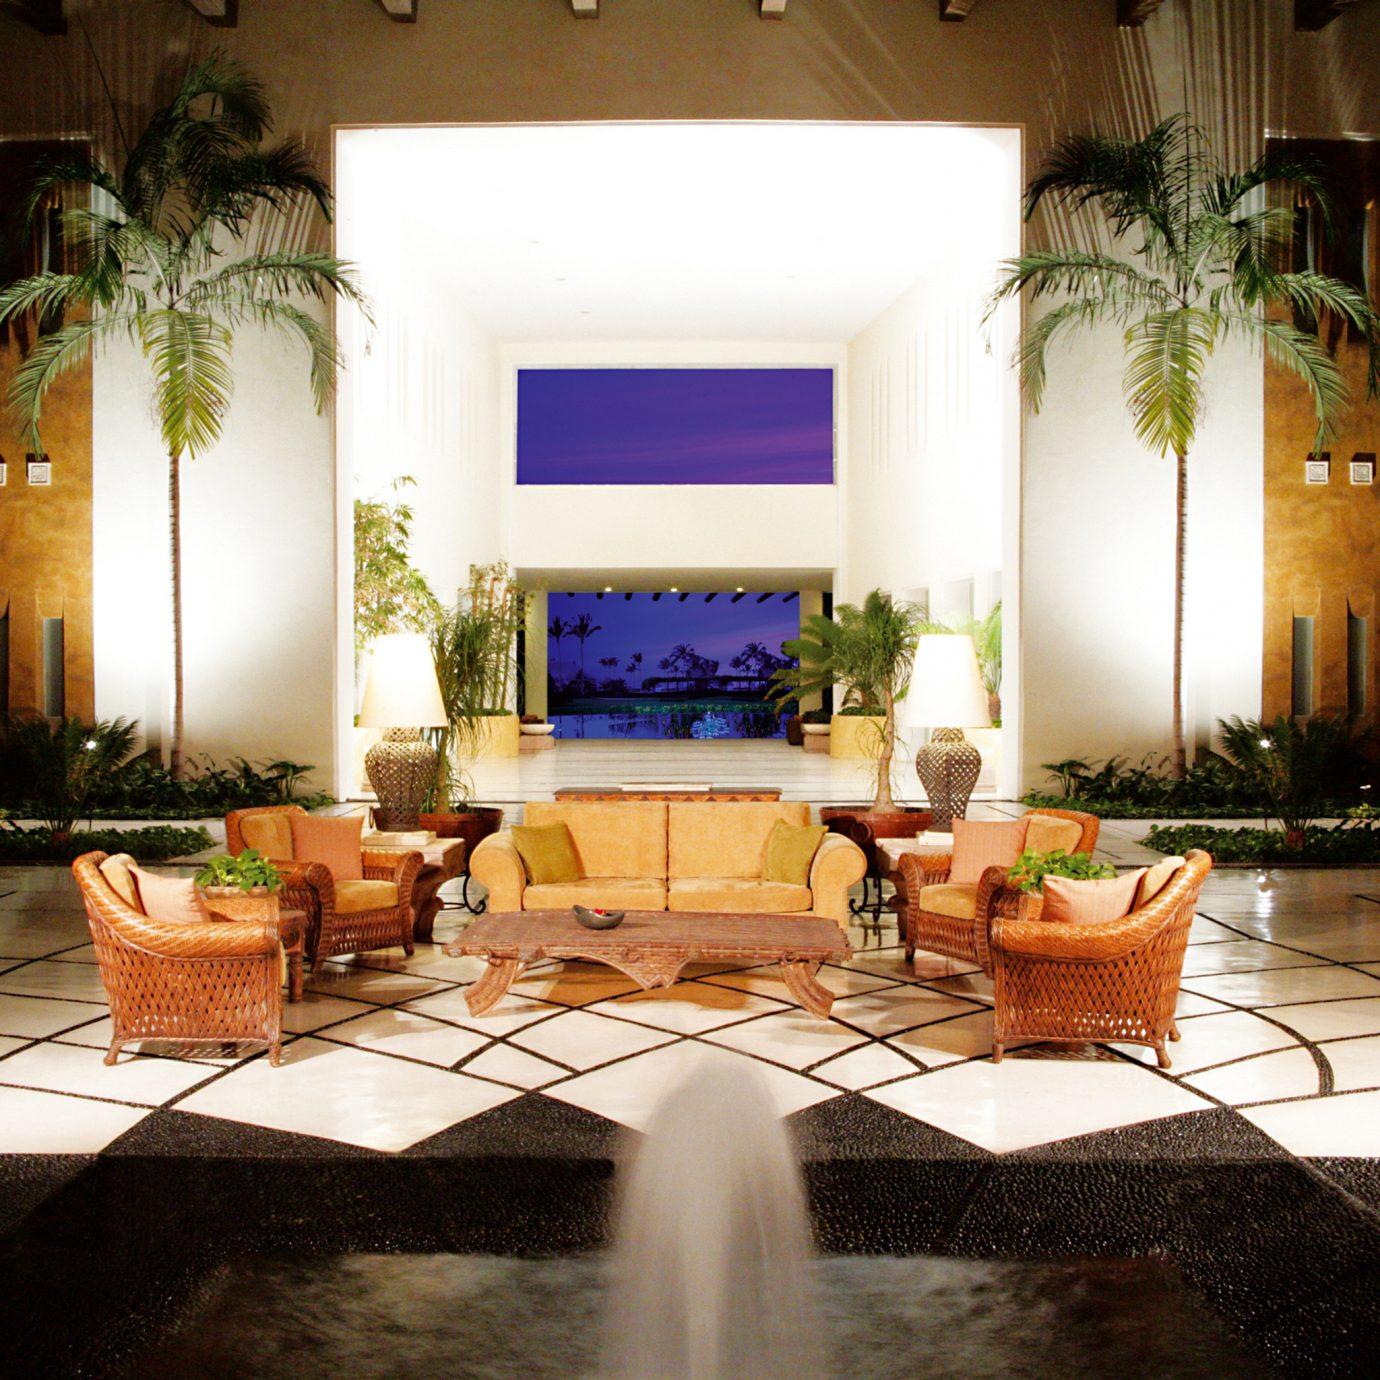 Beachfront Courtyard Lounge Outdoors Resort Romantic Tropical Lobby property living room home house mansion lighting Villa hacienda backyard rug stone